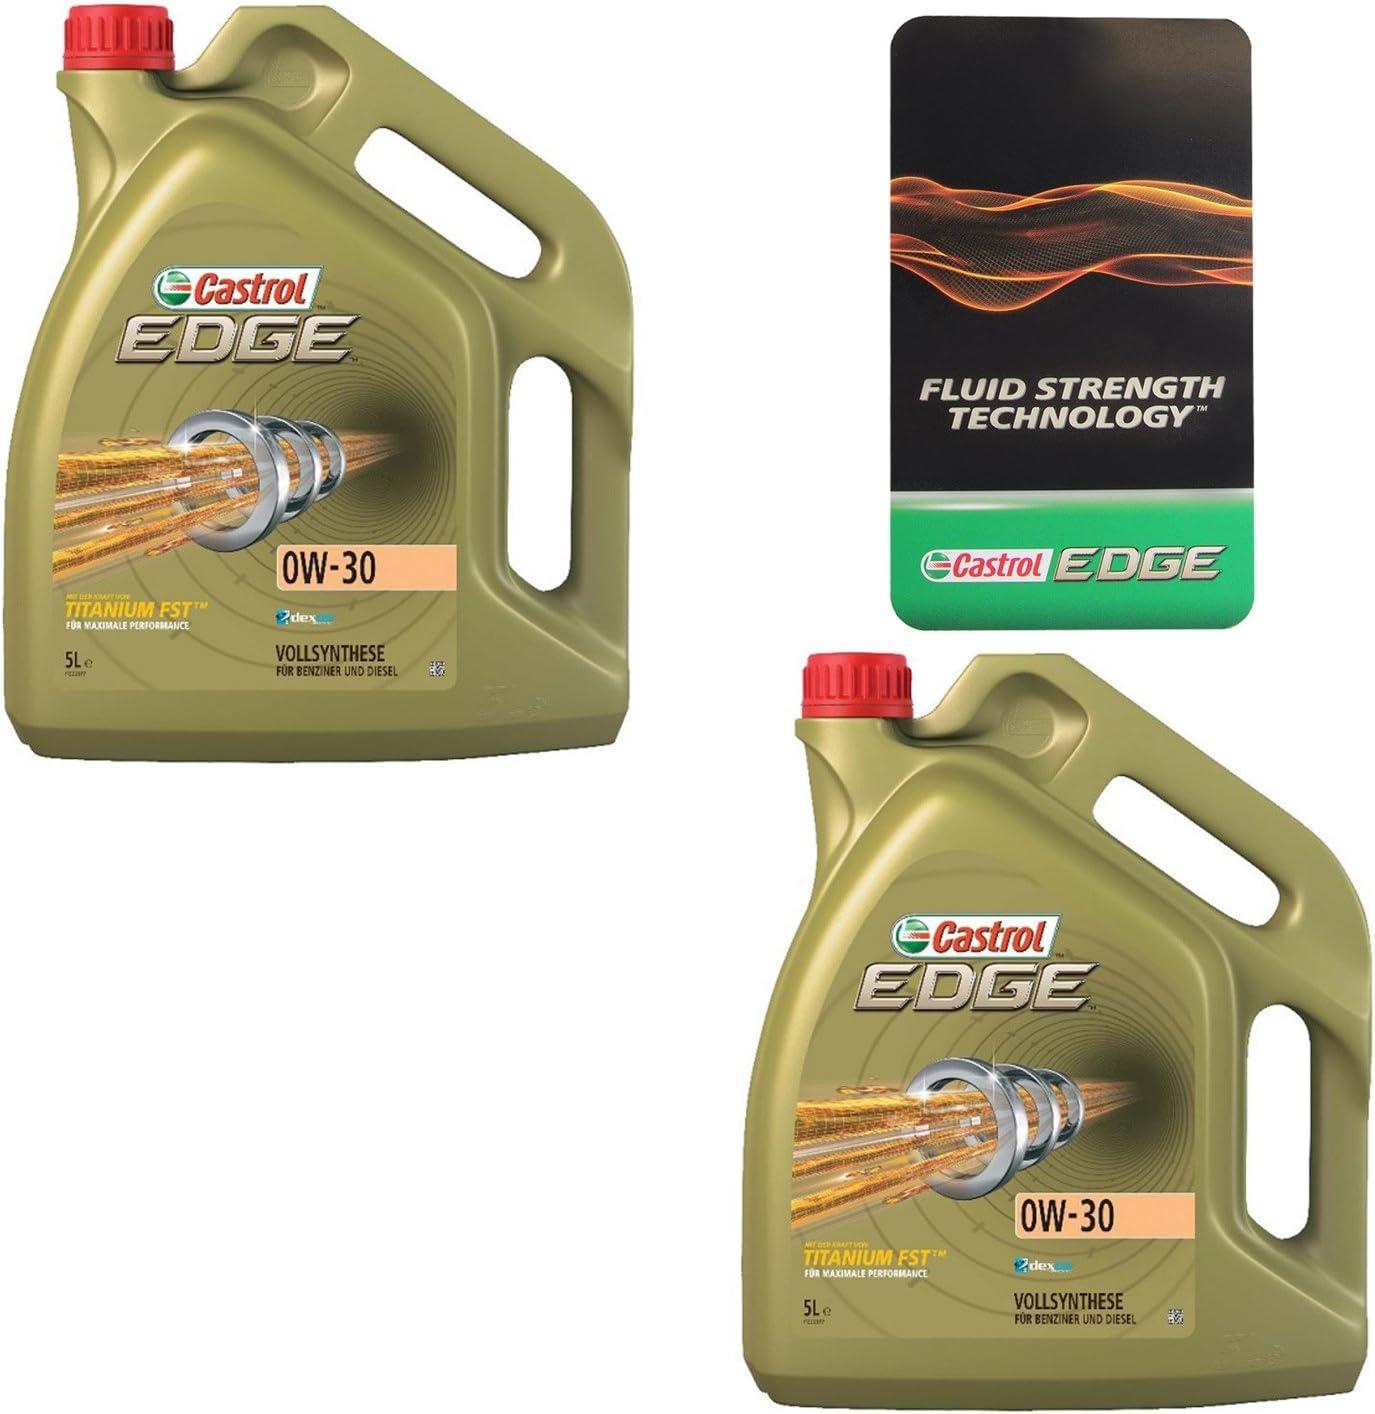 2x 5 L 10 Liter Castrol Edge Fluid Titanium 0w 30 Motoröl Inkl Castrol Ölwechselanhänger Auto